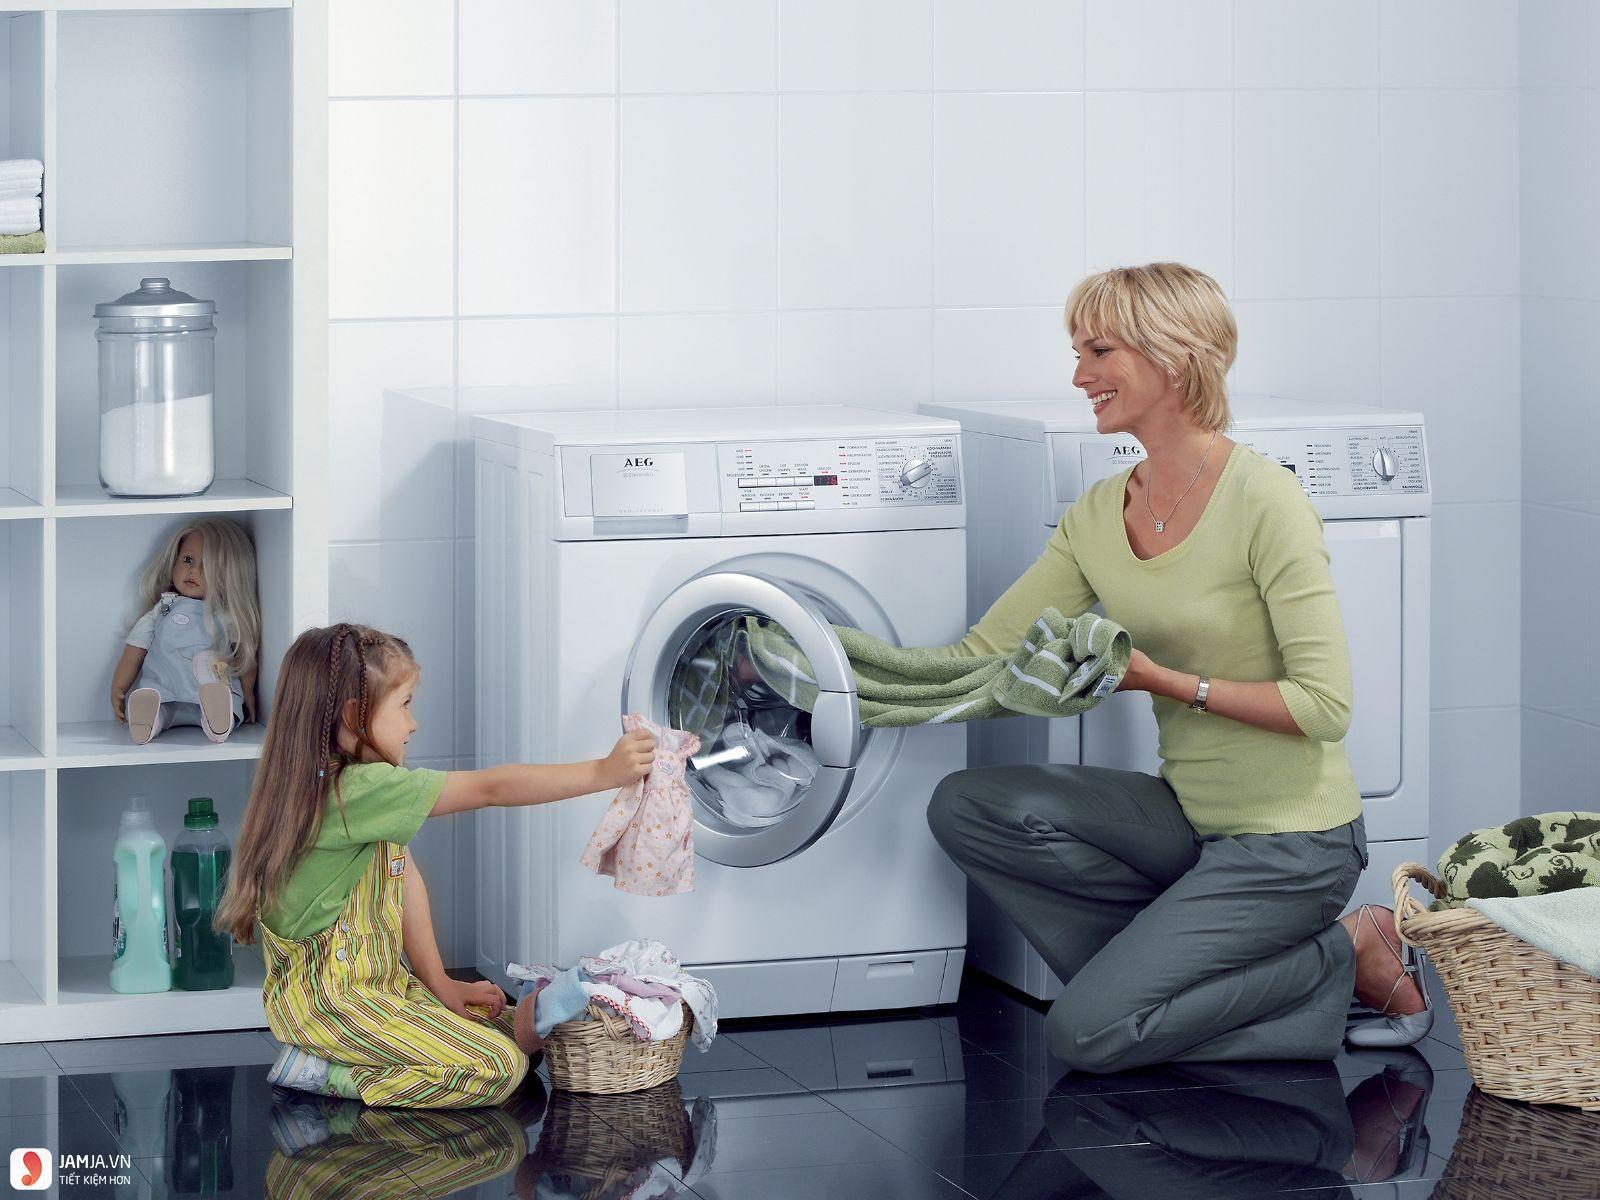 Cách dùng máy giặt Aqua 4